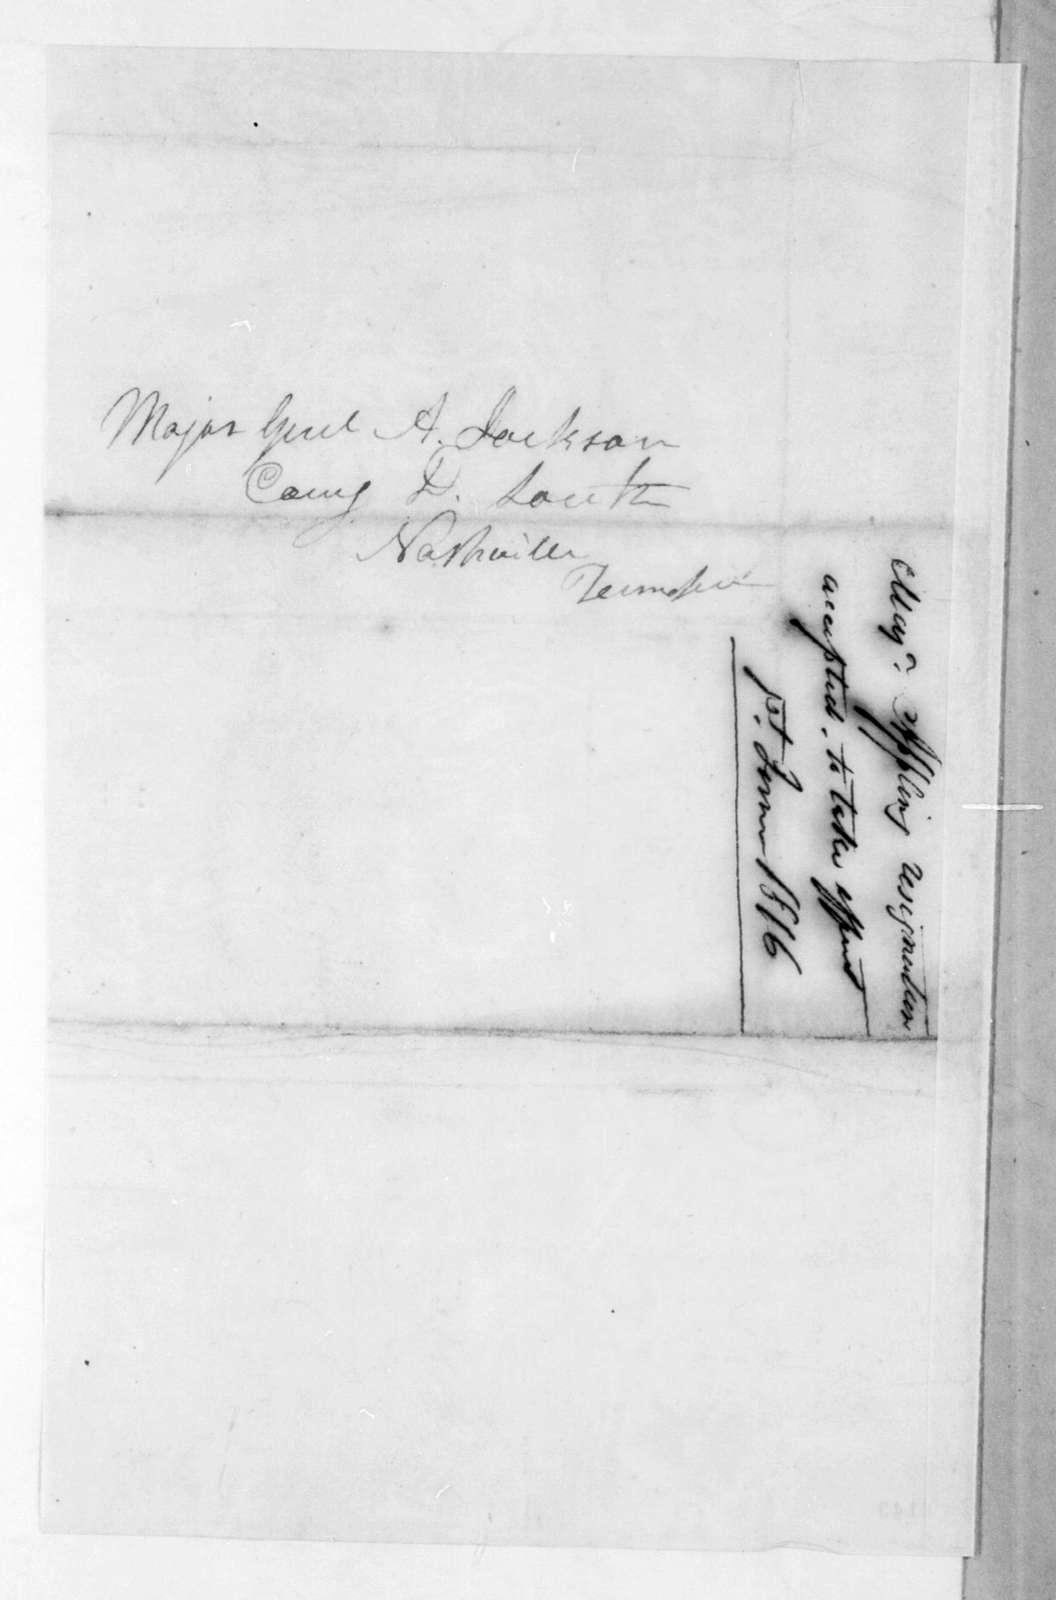 Daniel Appling to Andrew Jackson, April 18, 1816